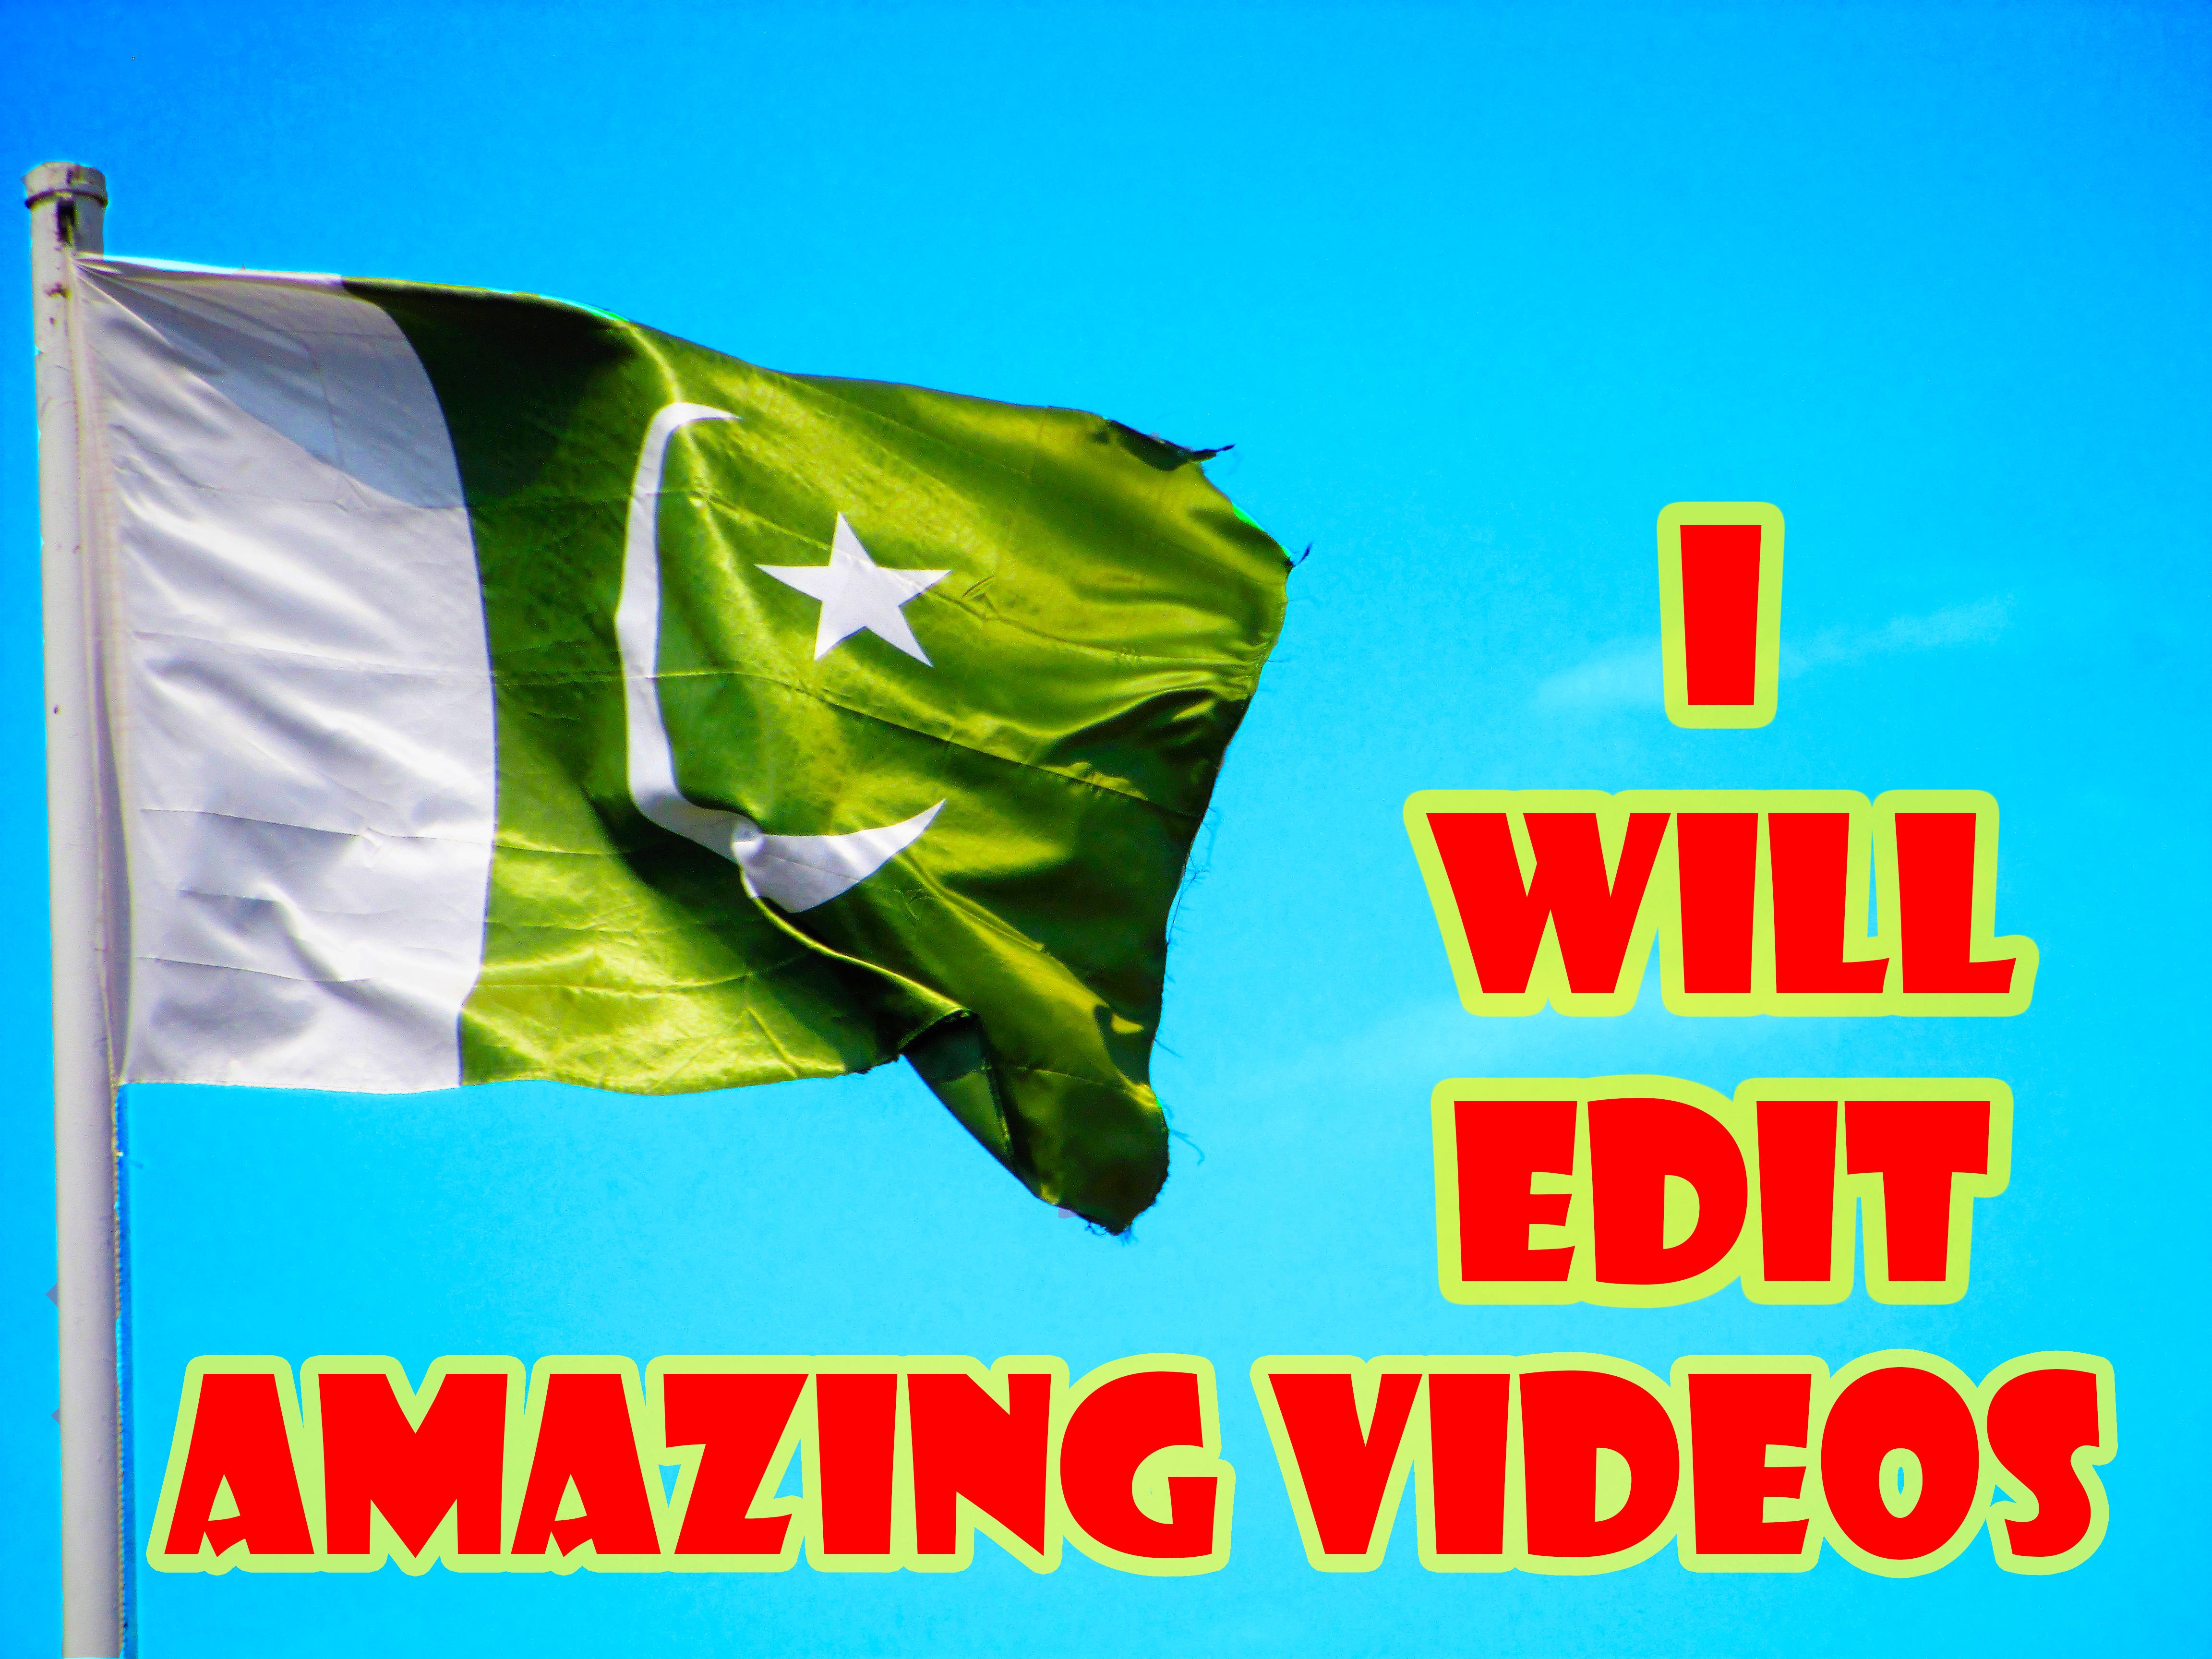 II will edit amazing videos fr you